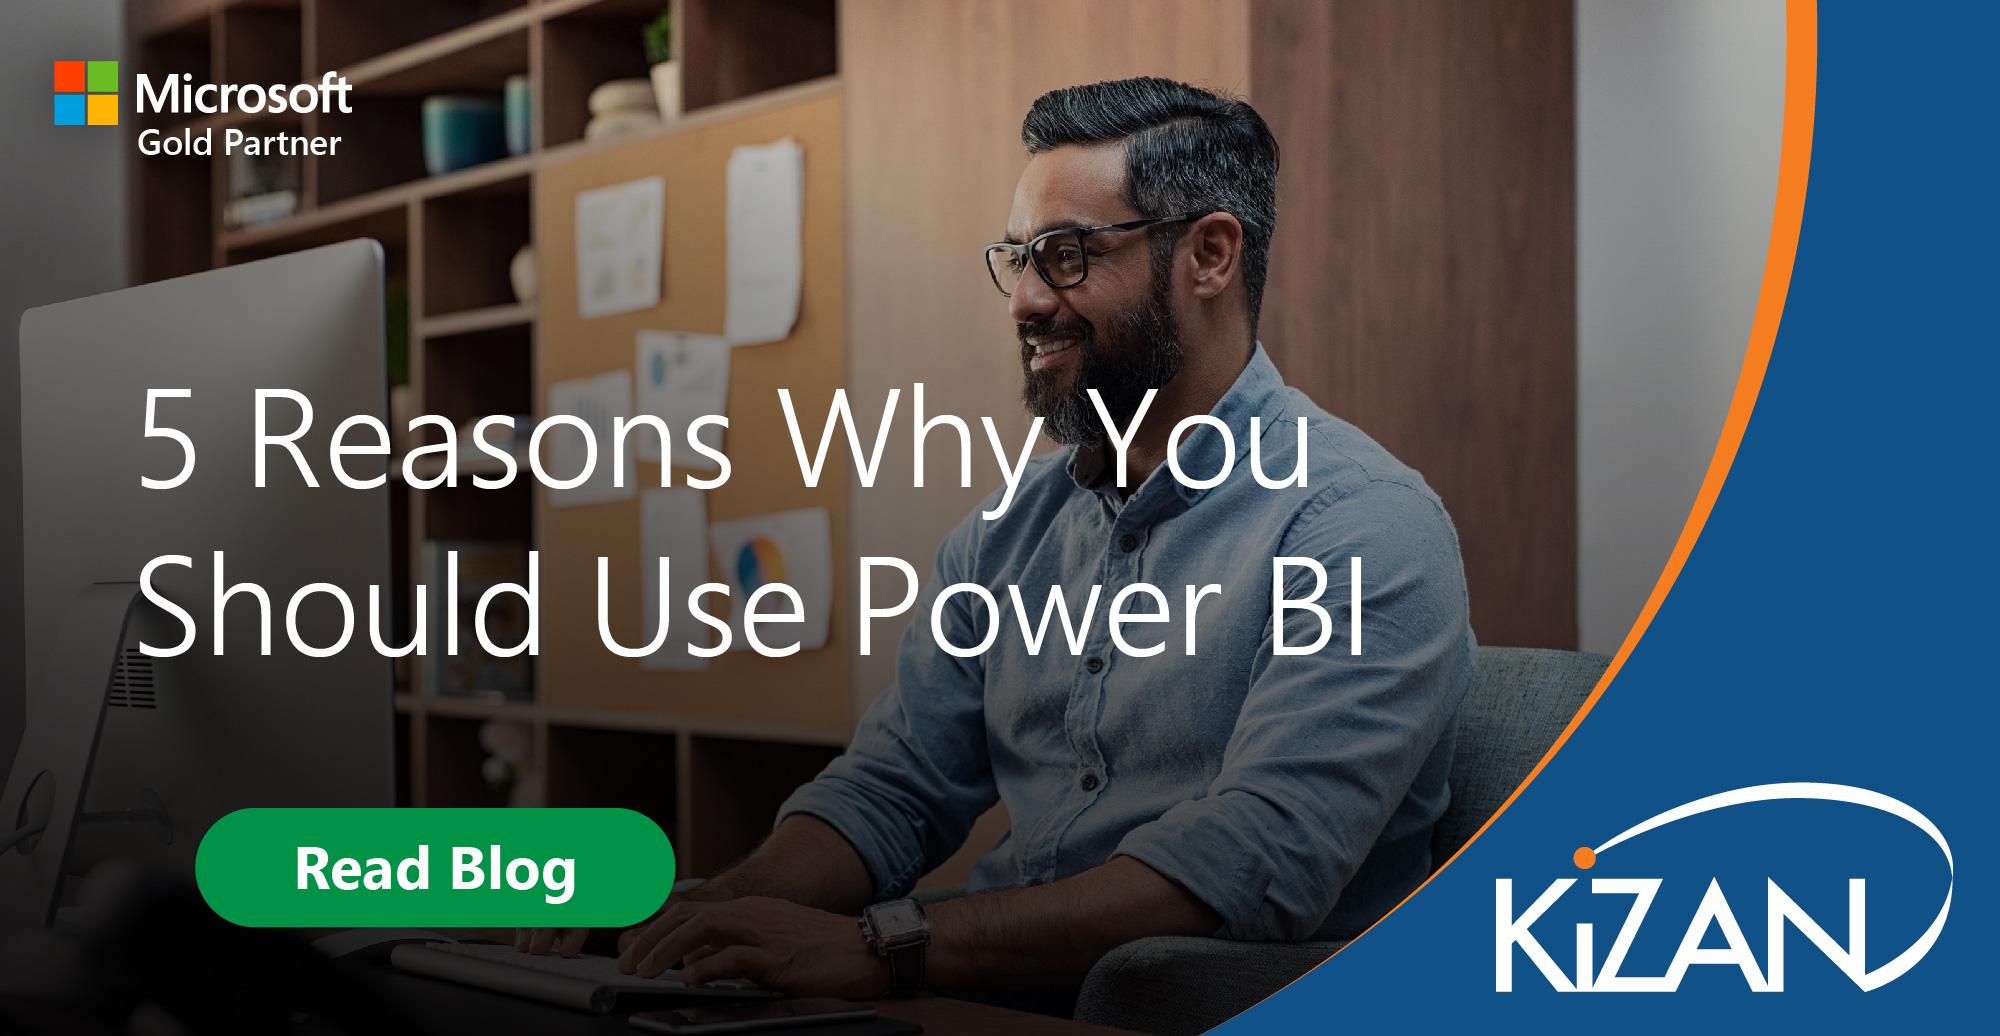 KiZAN | 5 Reasons Why You Should Use Power BI